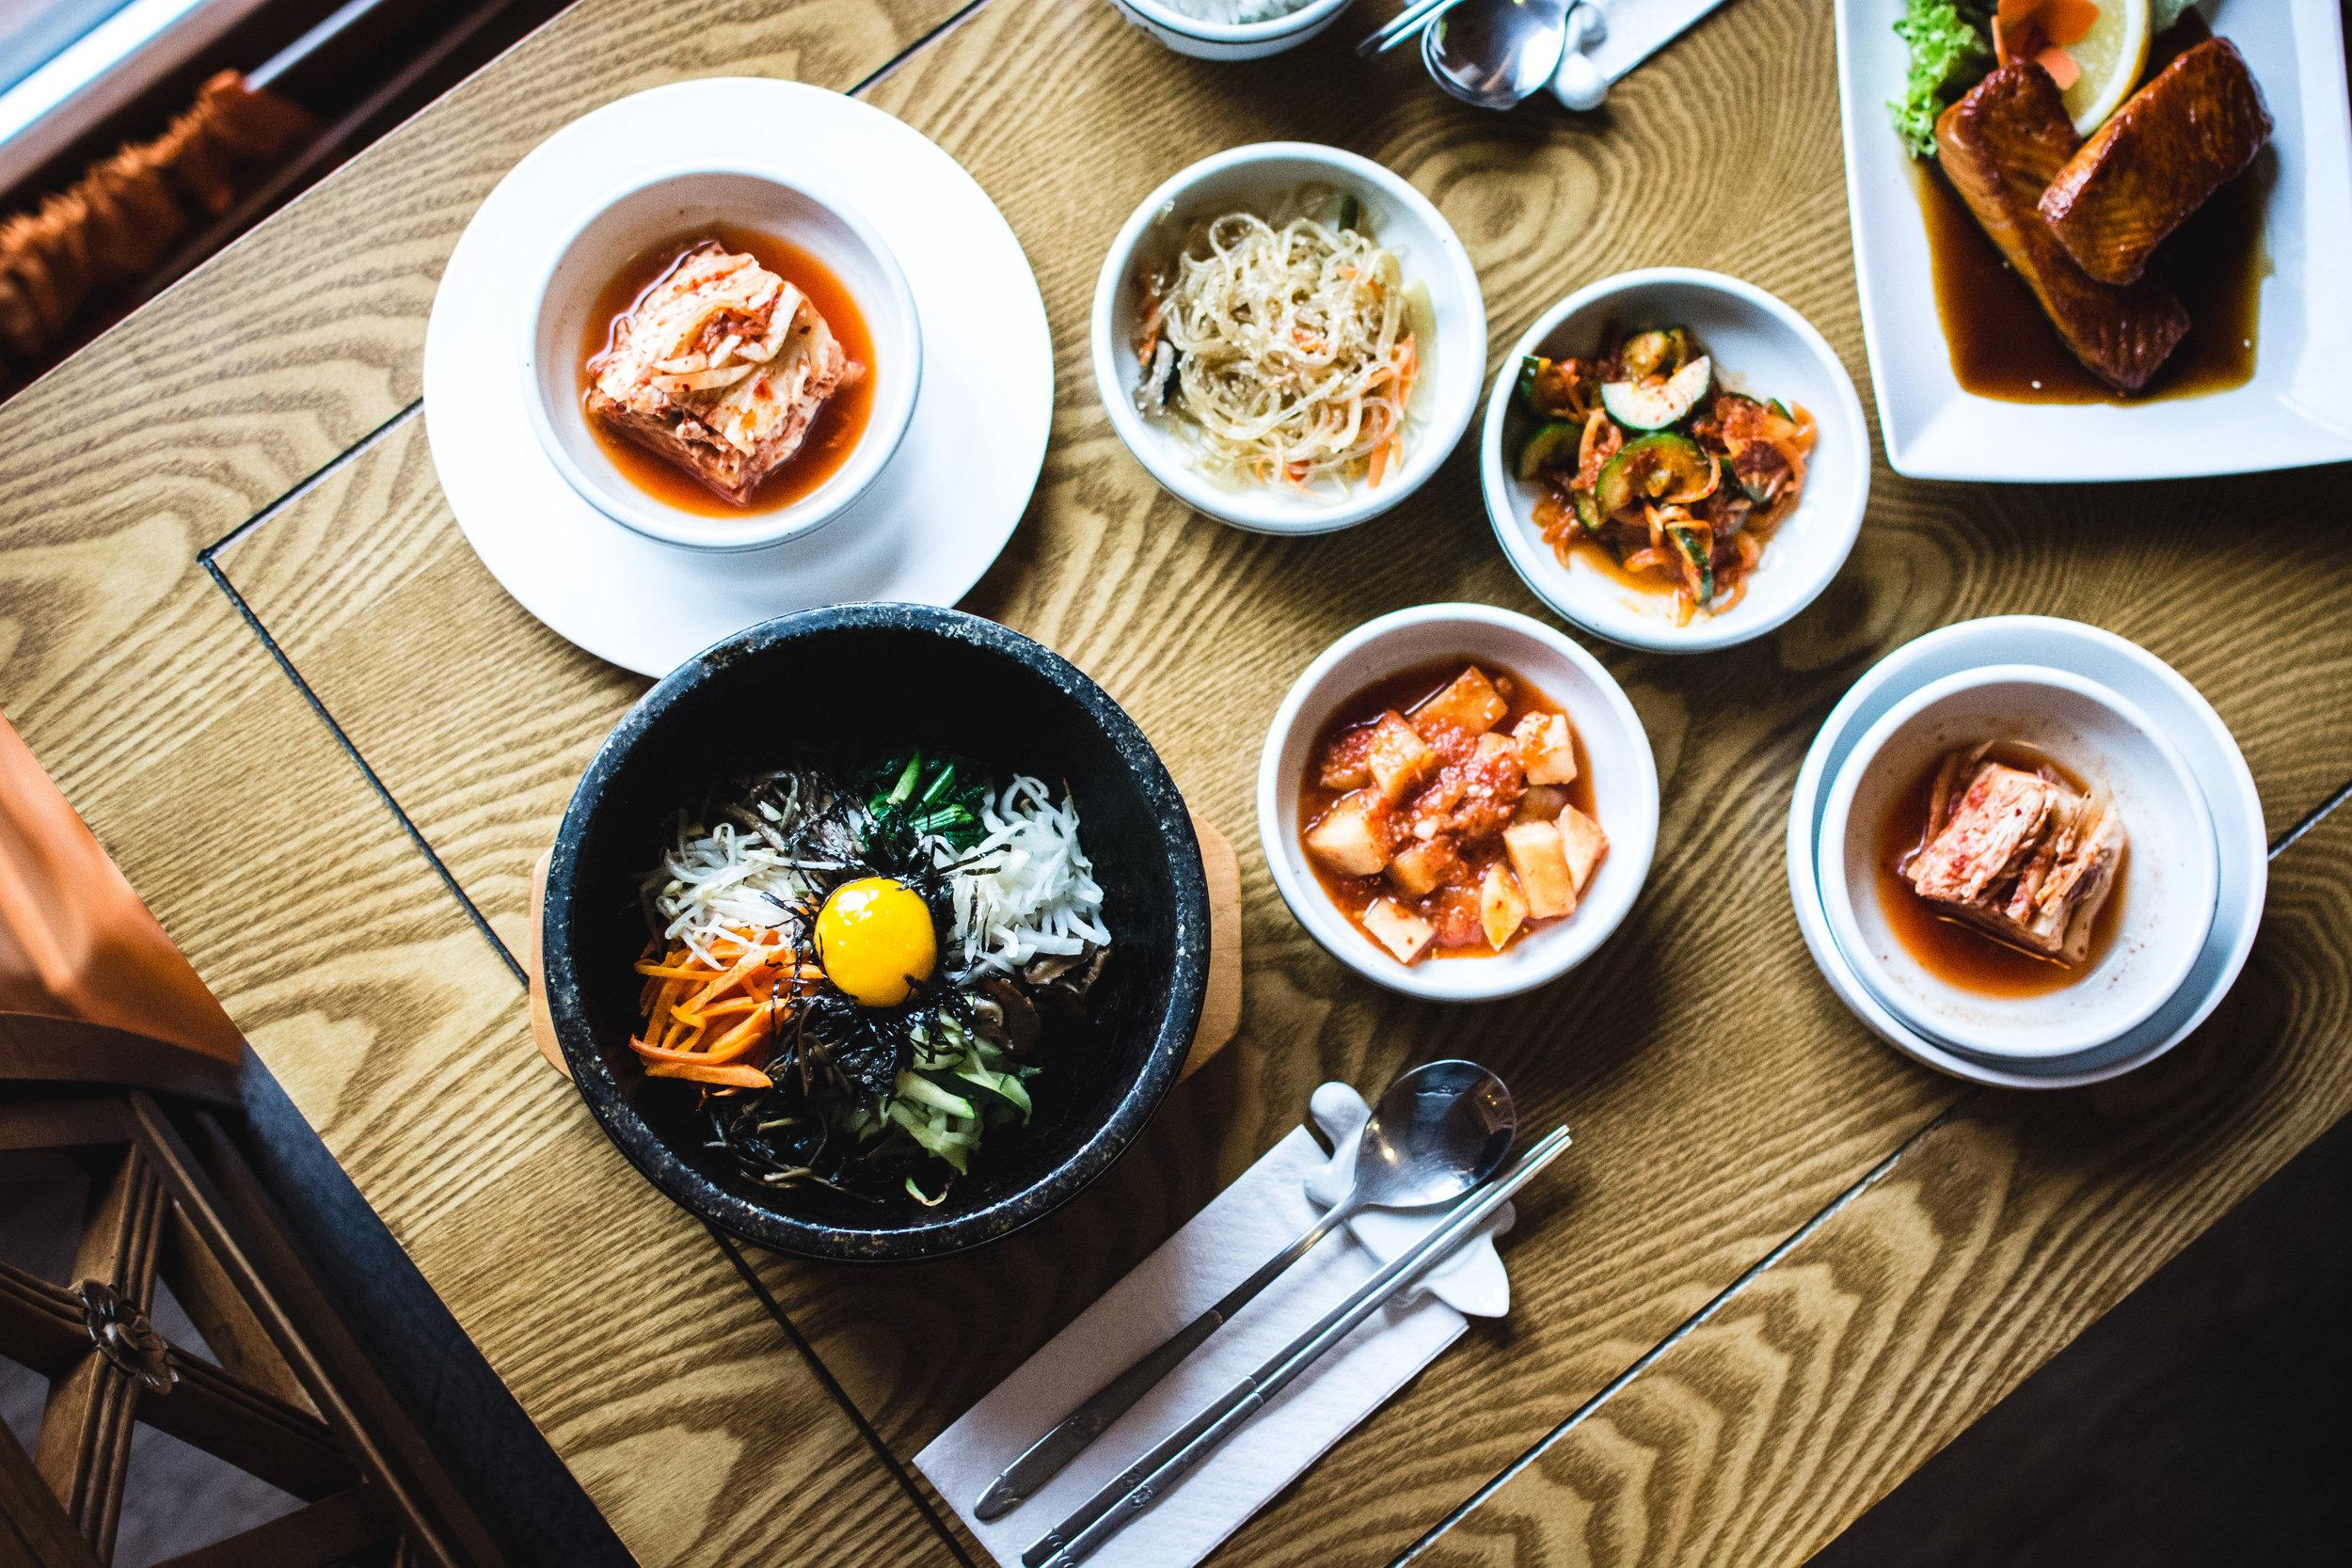 Restaurants - Discover incredible restaurants in Hudson County